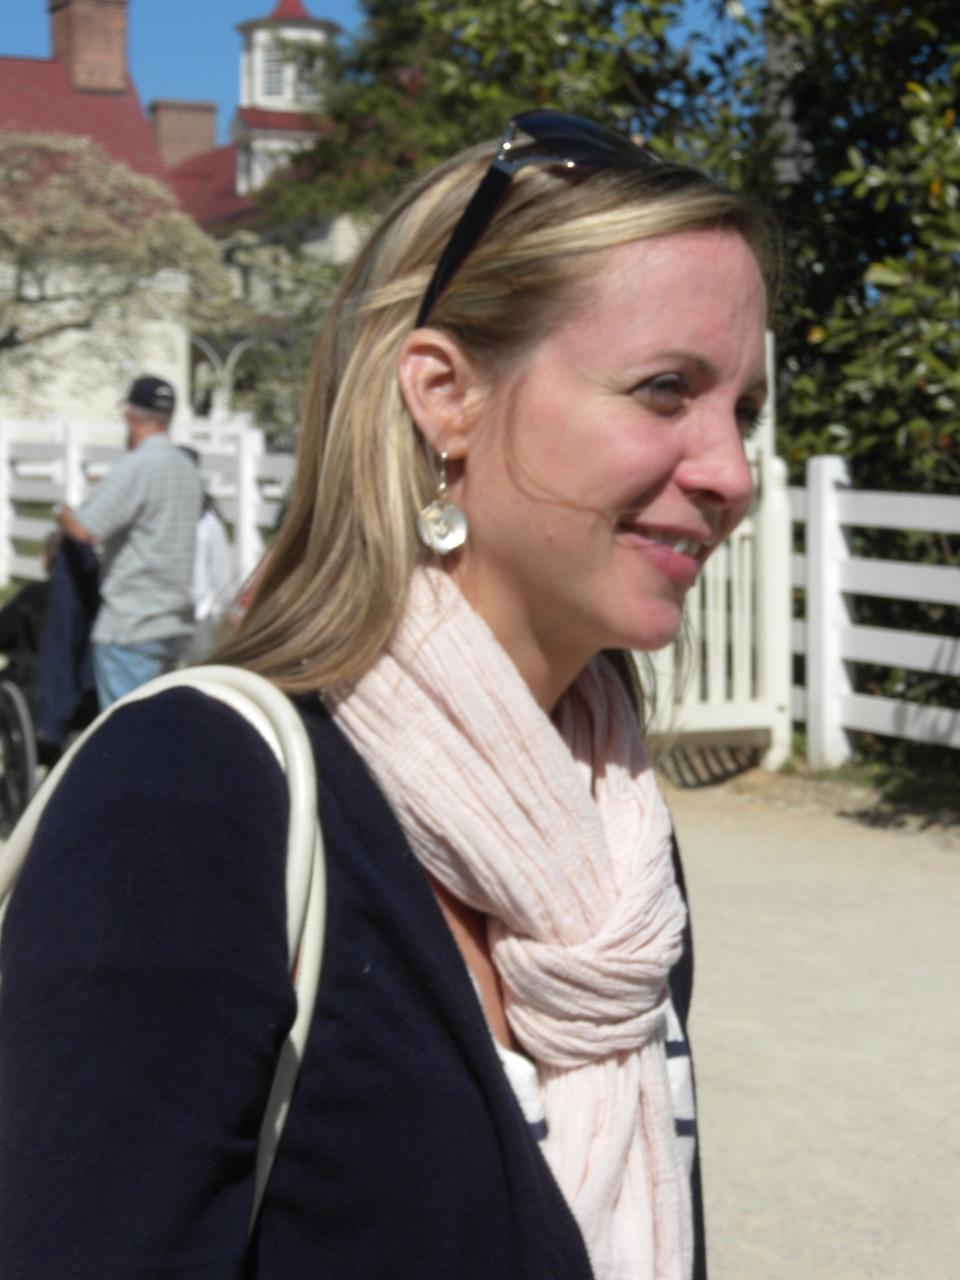 Kristin Haffert, Mine The Gap cofounder